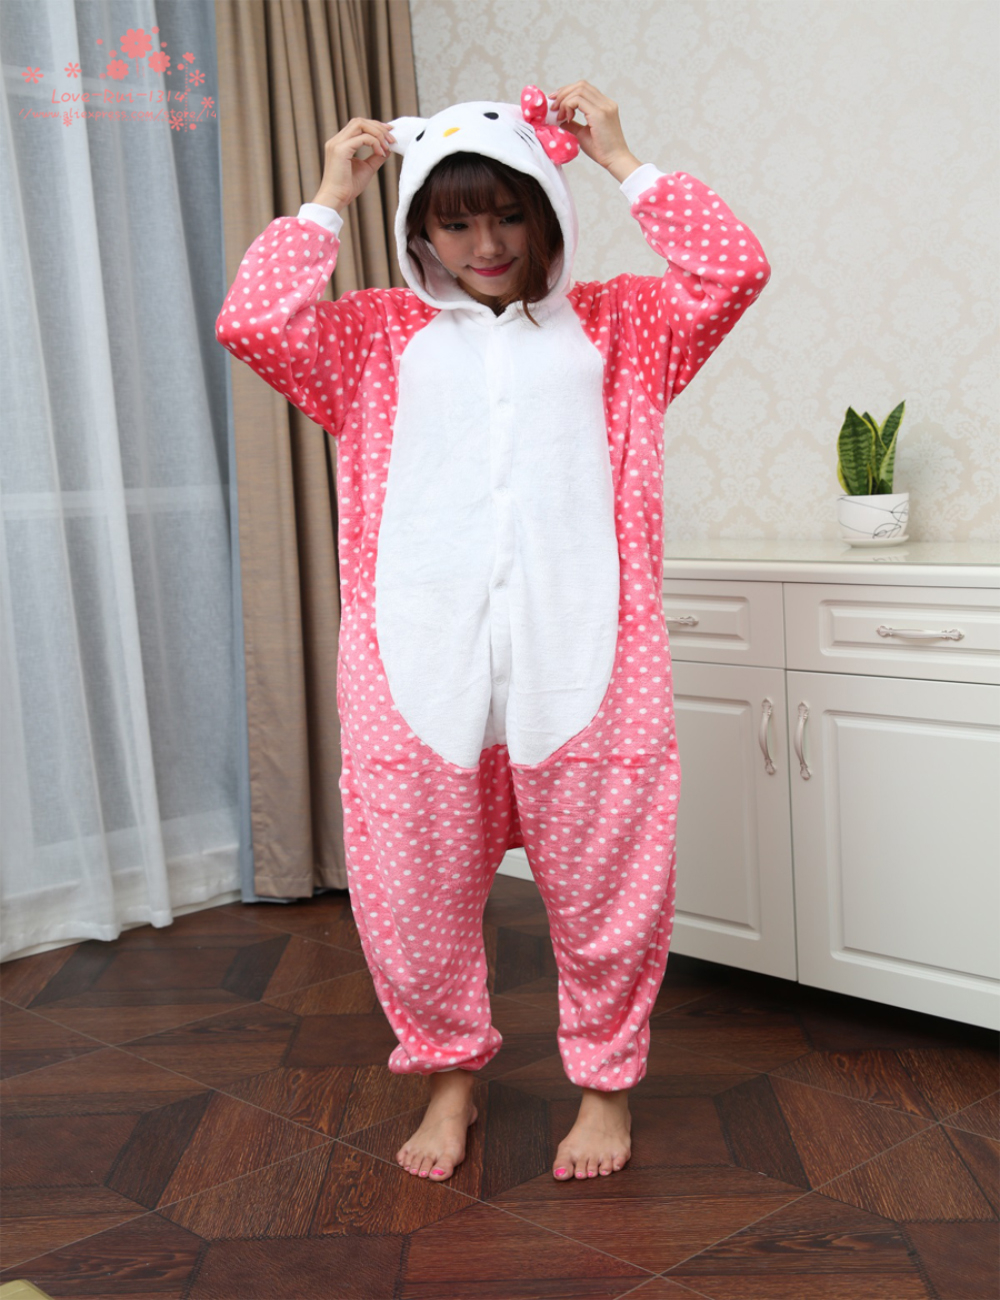 Hotsale 2015 Winter New Sleepsuit Adults Cartoon Cheshire Cat Onesies Unisex Onesies Pajamas Cosplay Costumes Plus Size S/M/L/XL(China (Mainland))